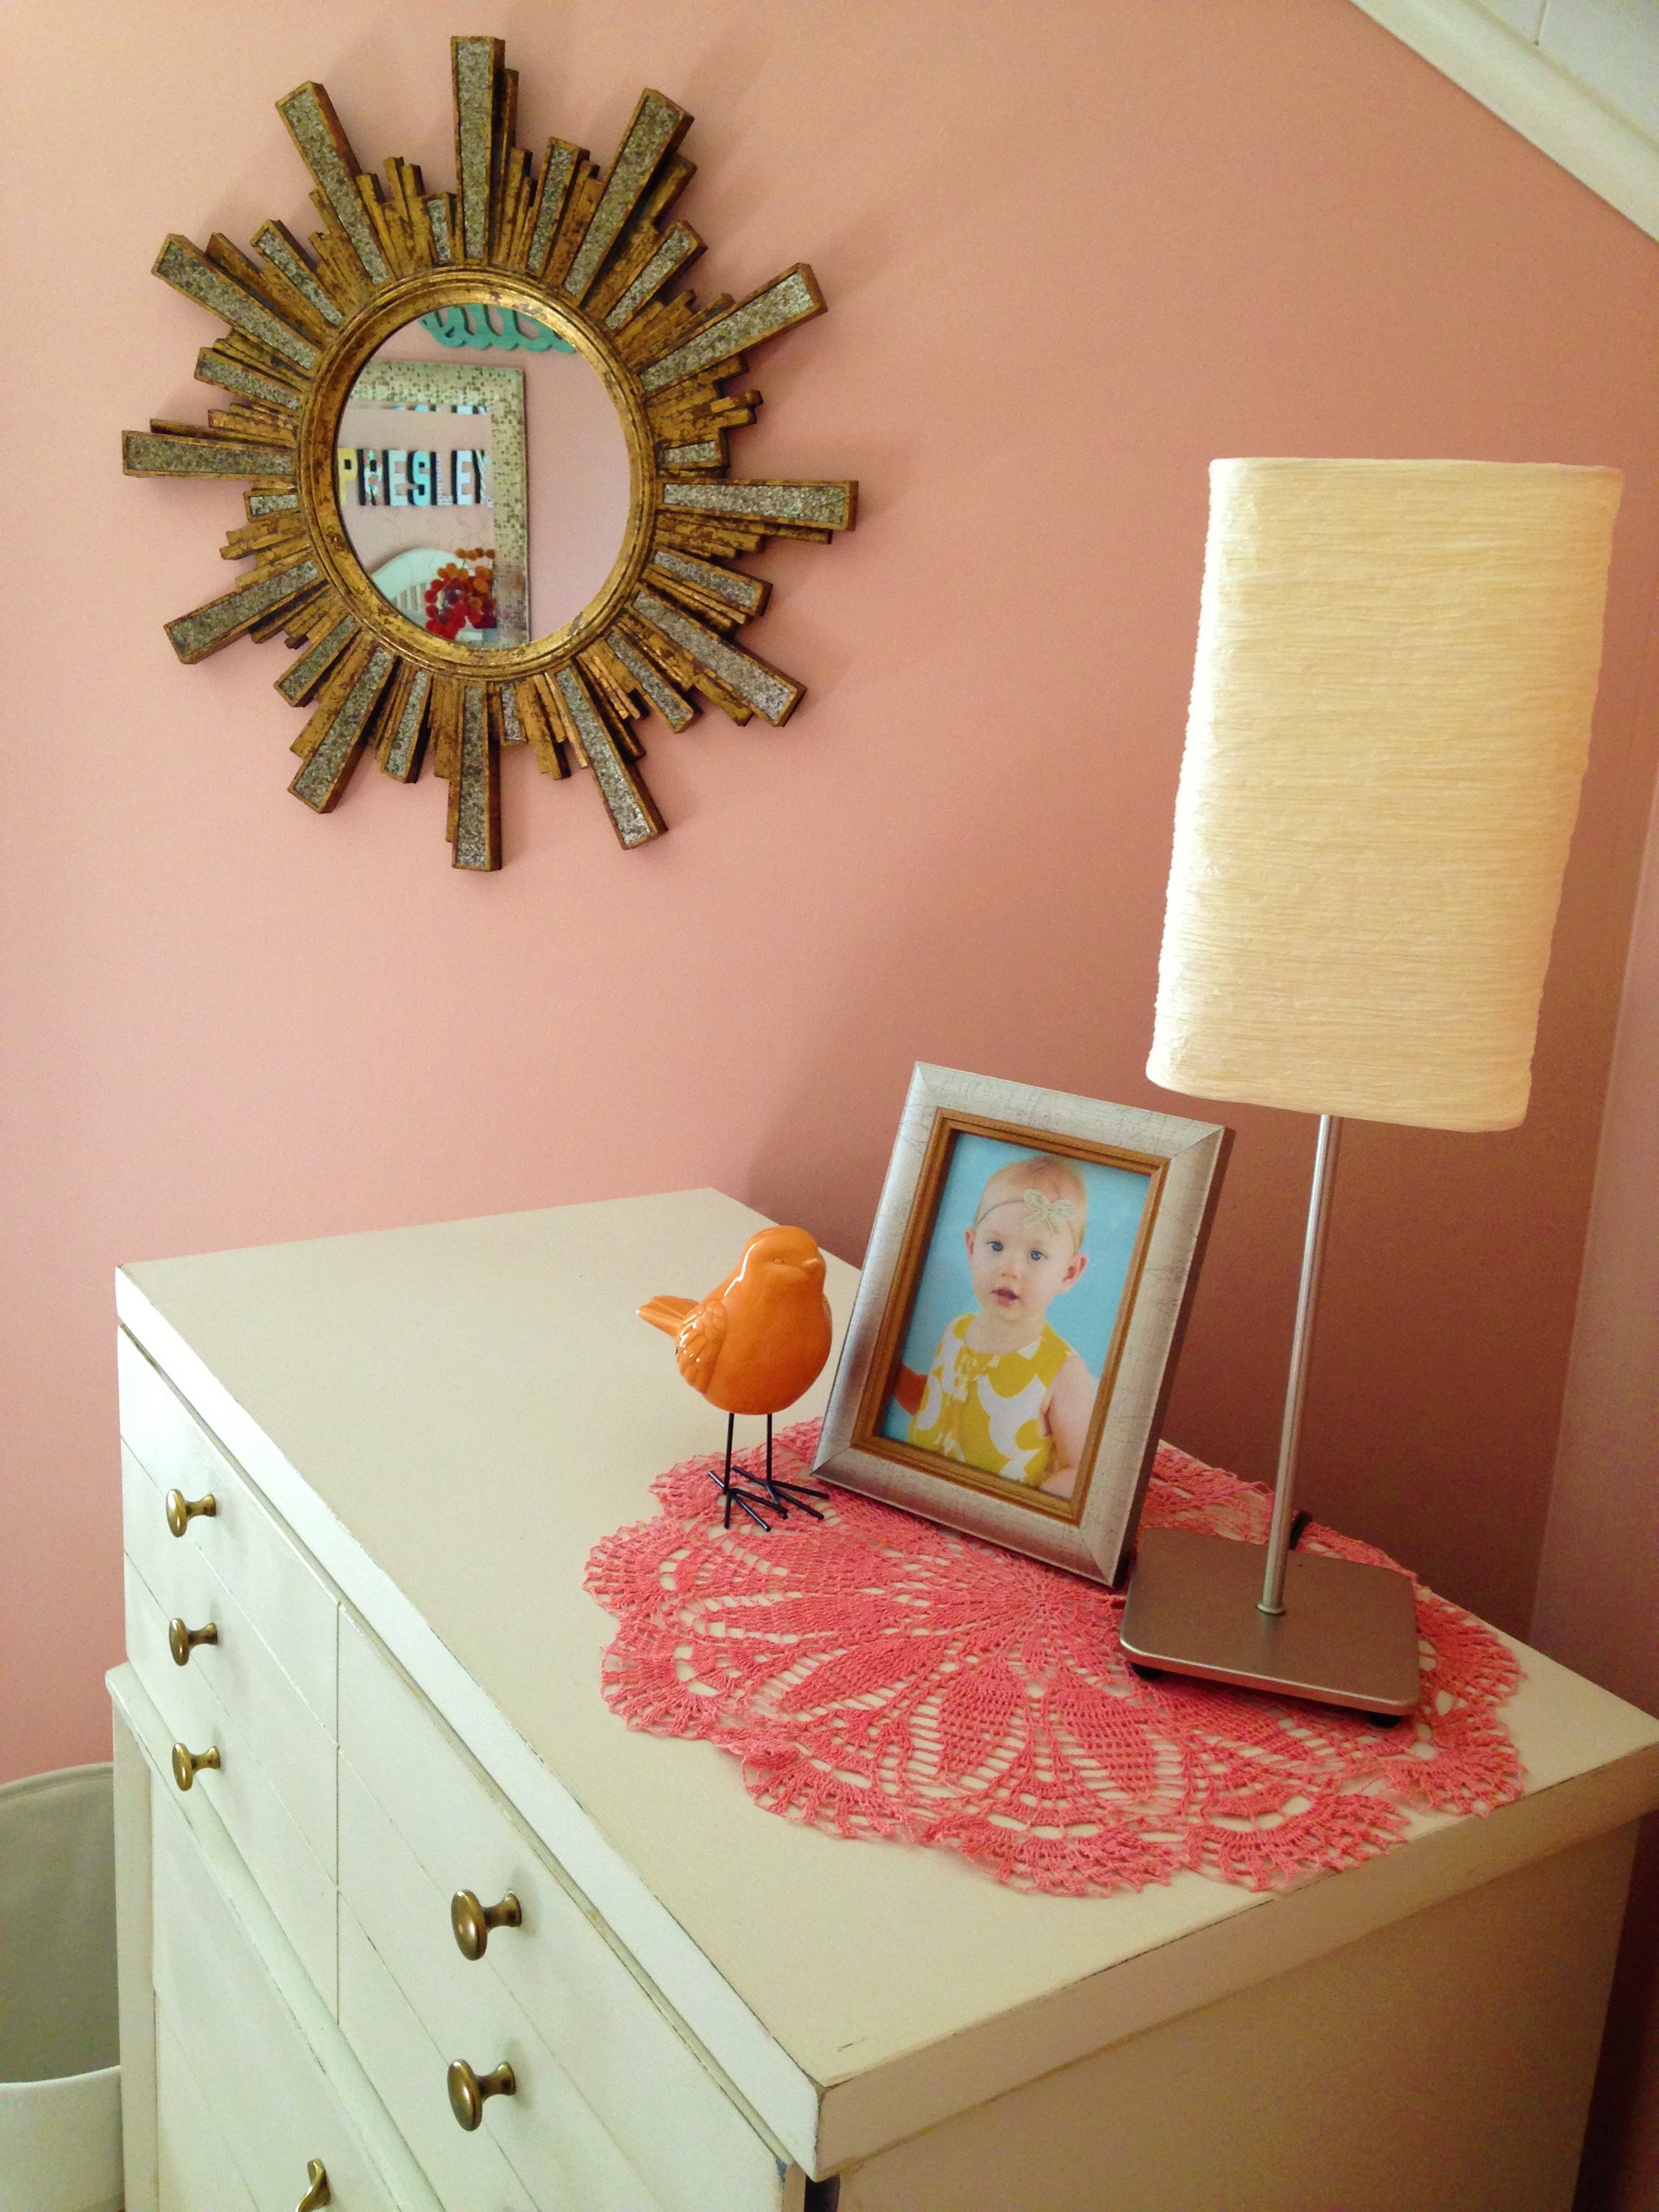 Presley's Bedroom - After